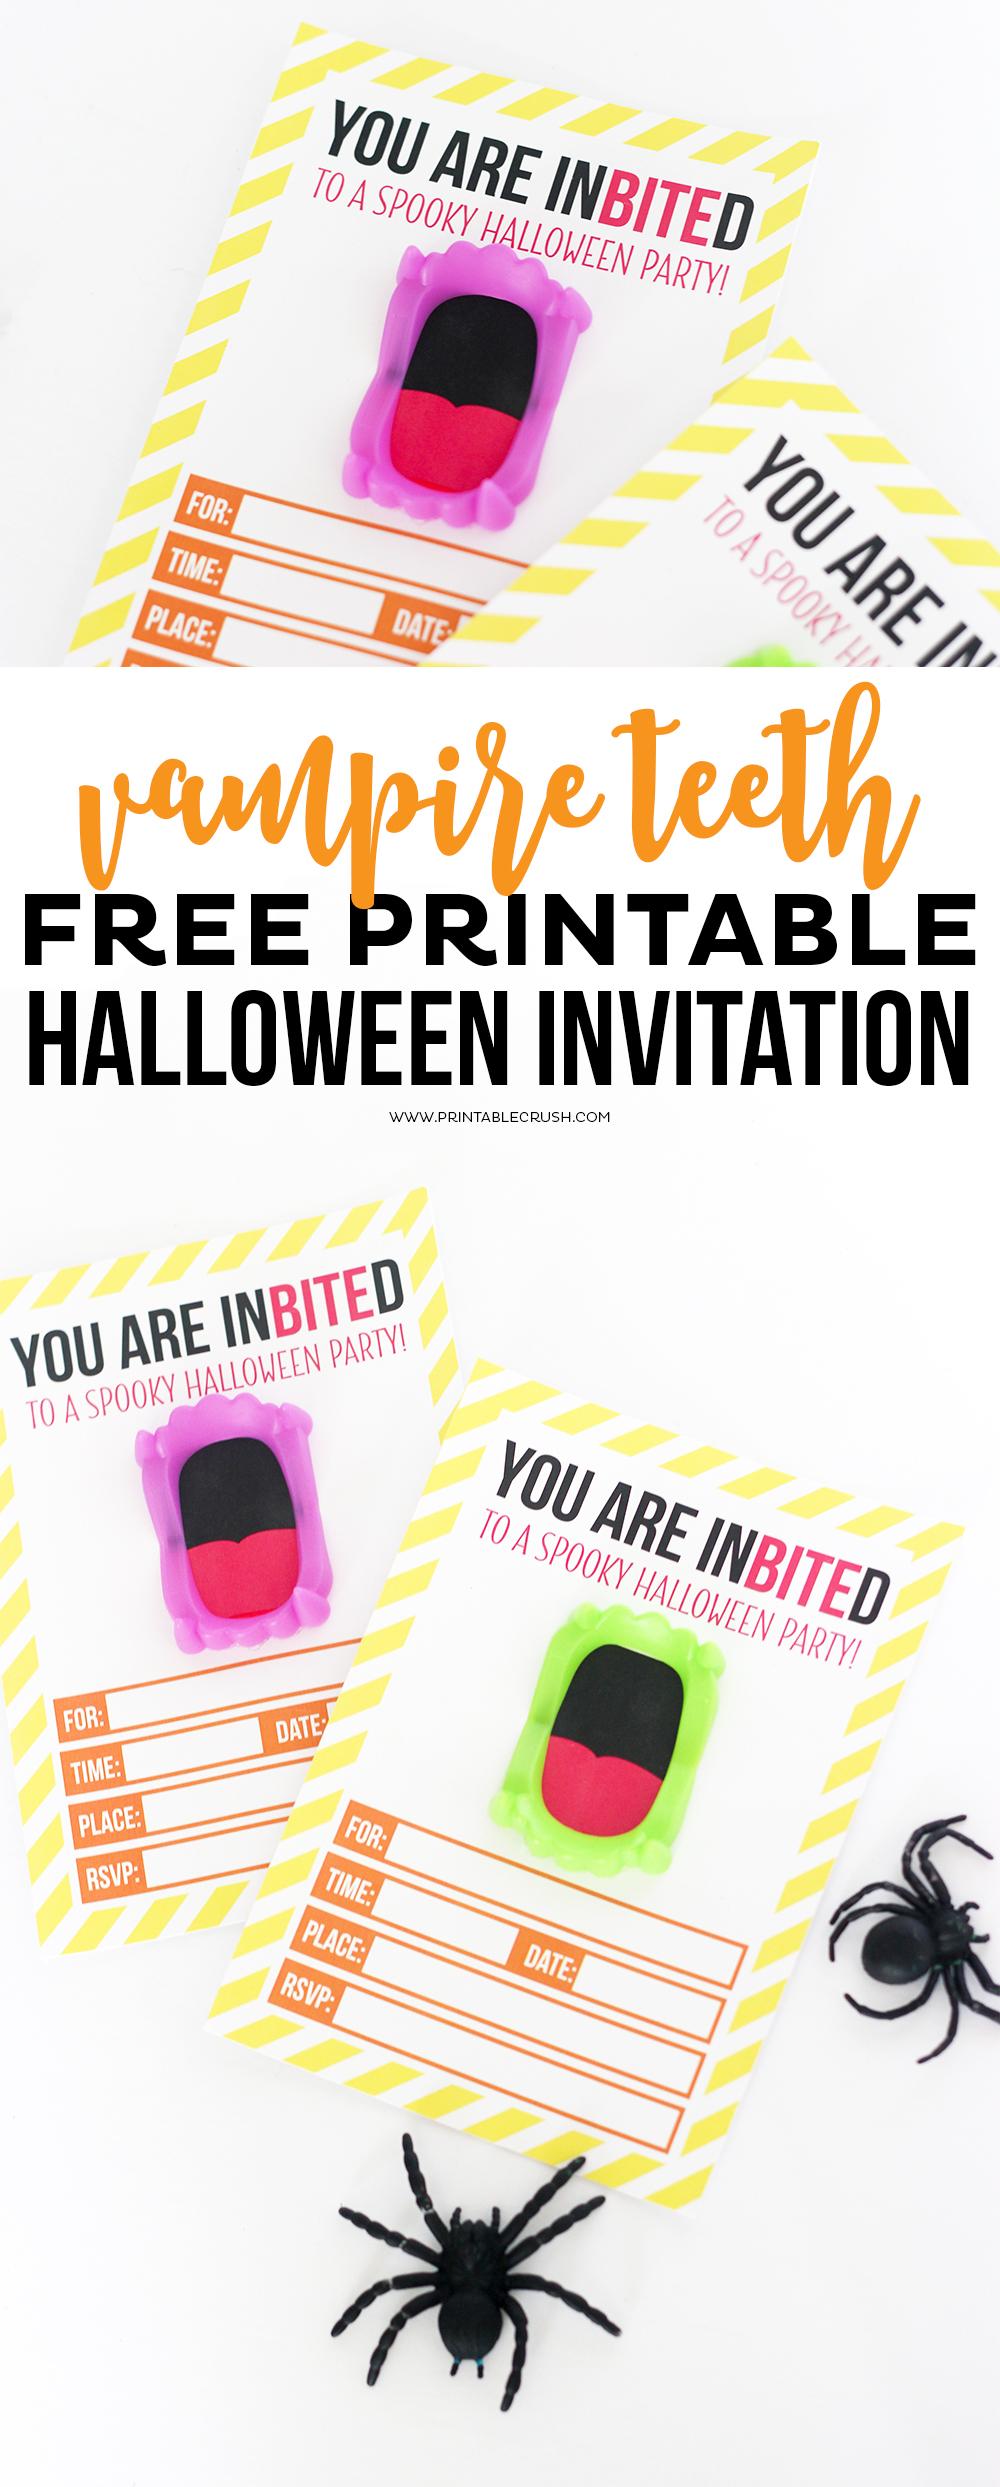 photograph regarding Halloween Invitations Printable titled Cost-free Printable Vampire Halloween Invitation - Printable Crush